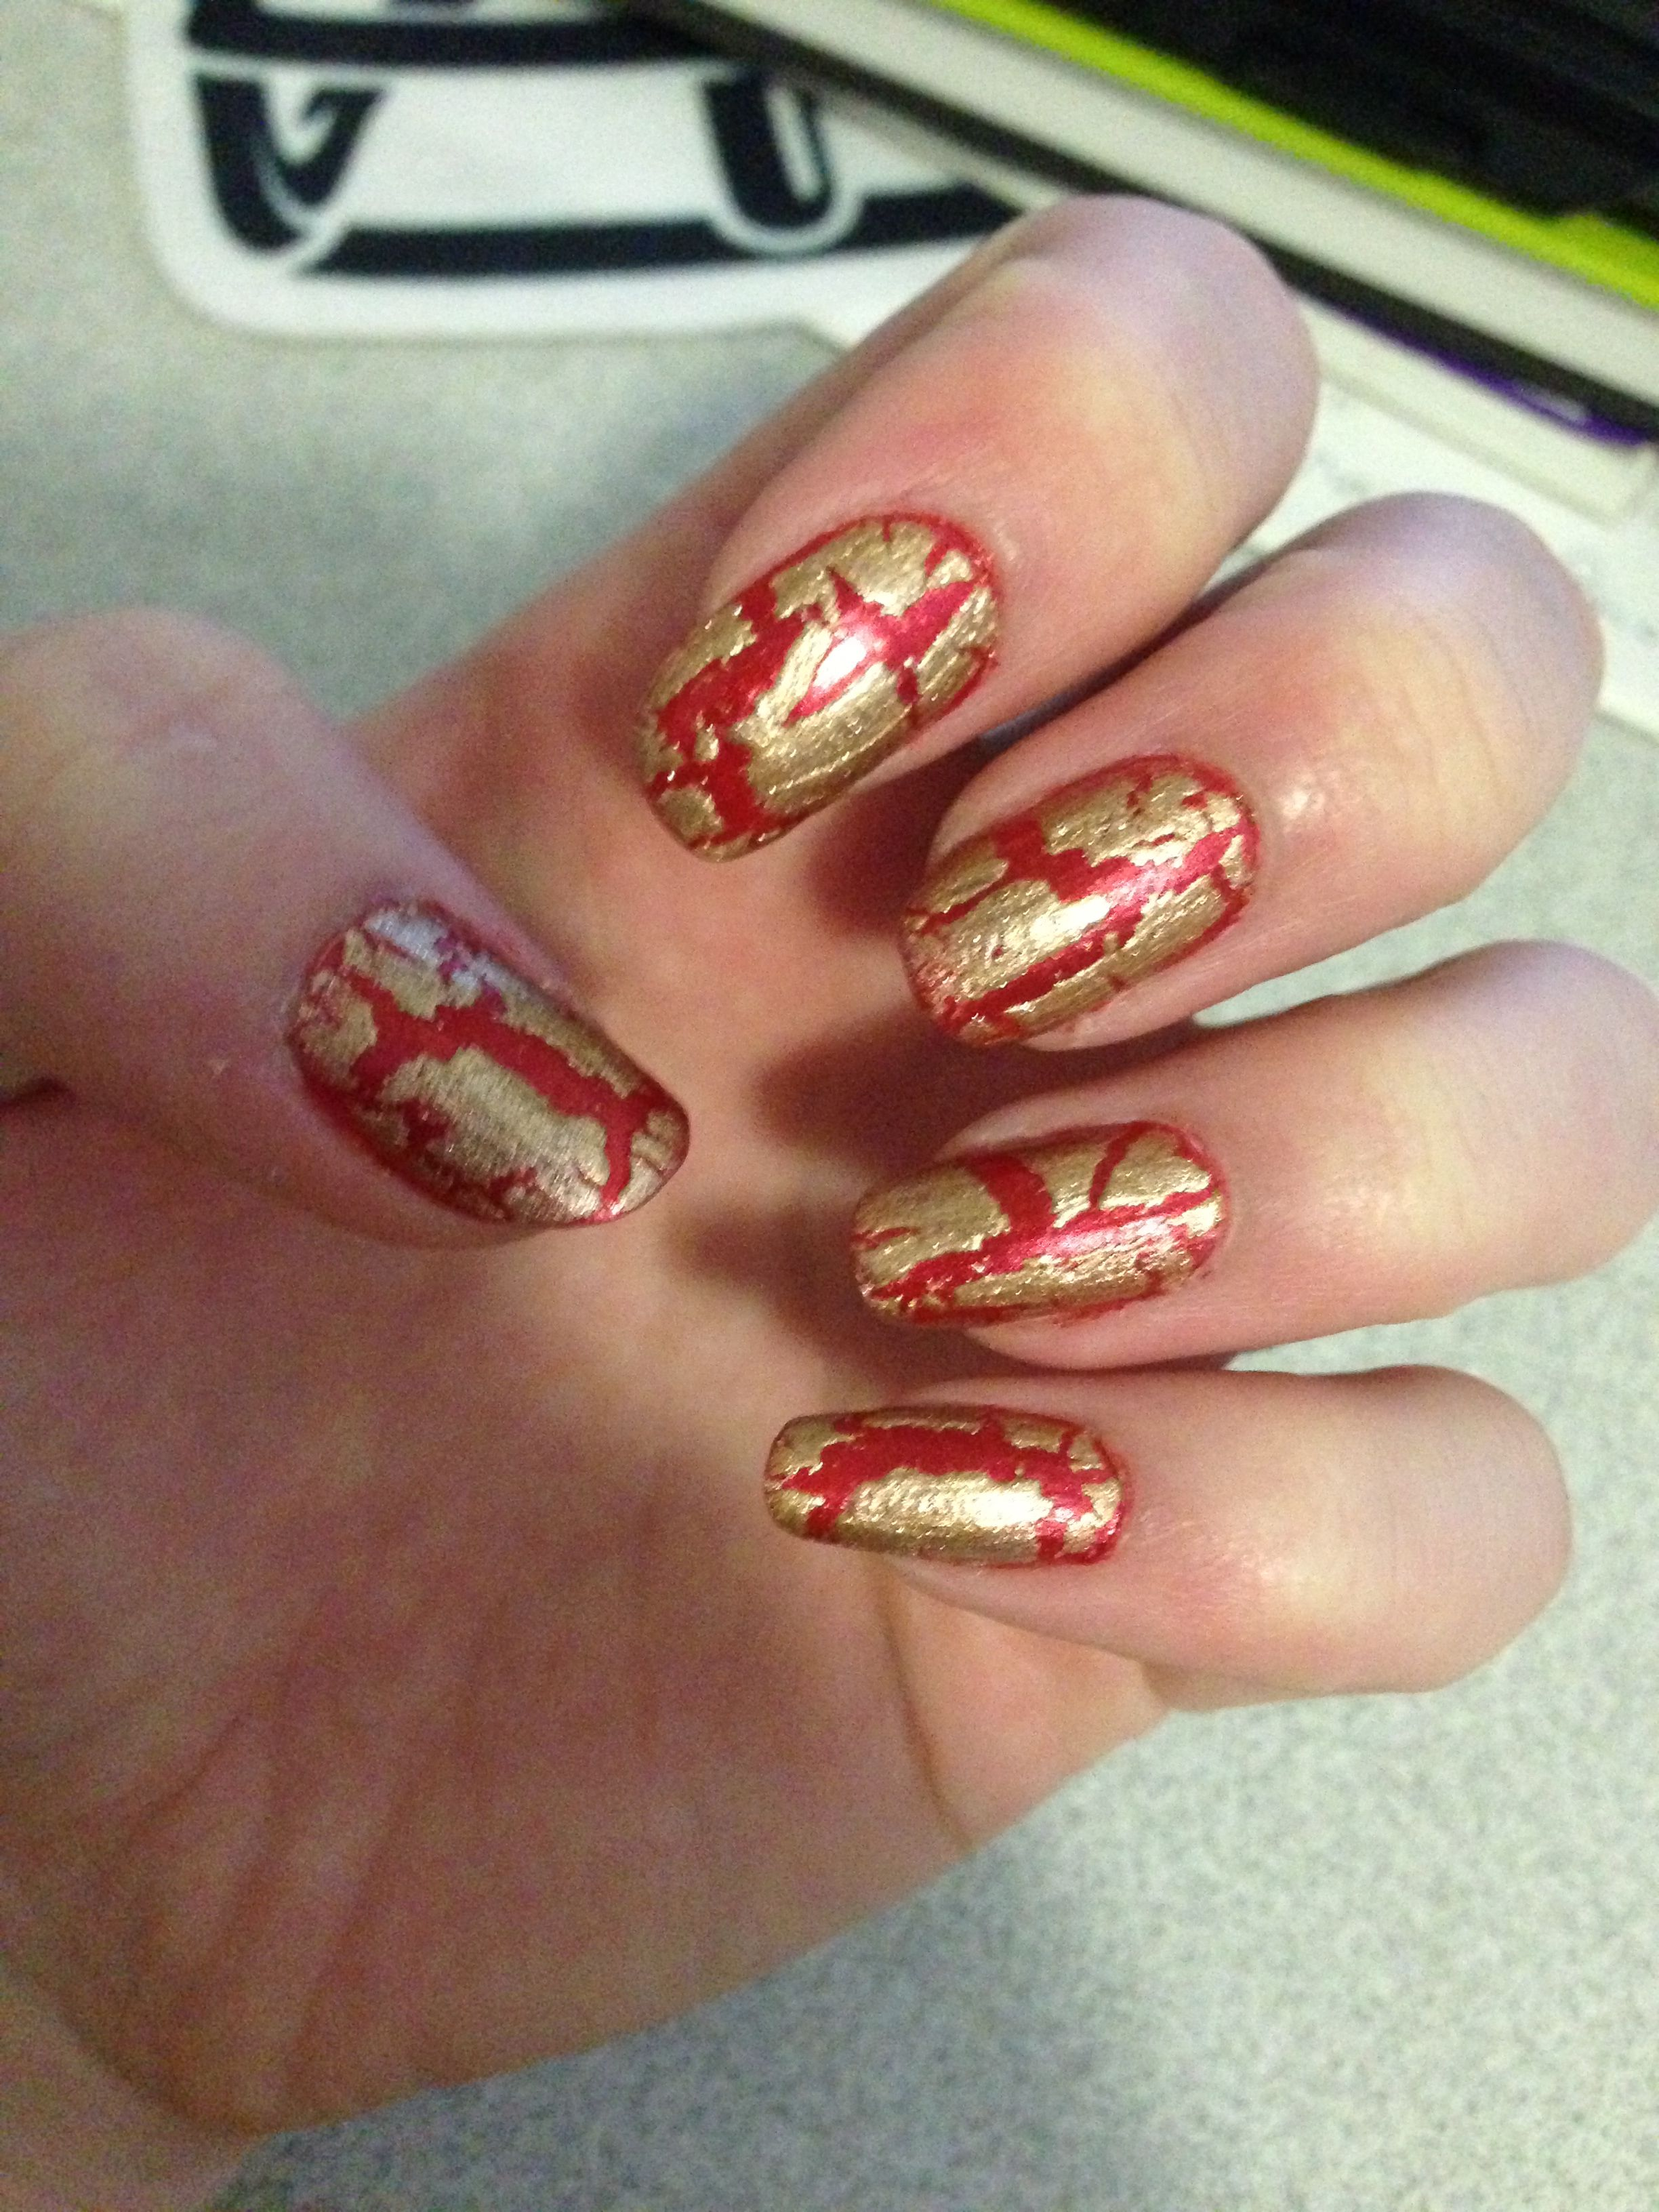 crackle nails